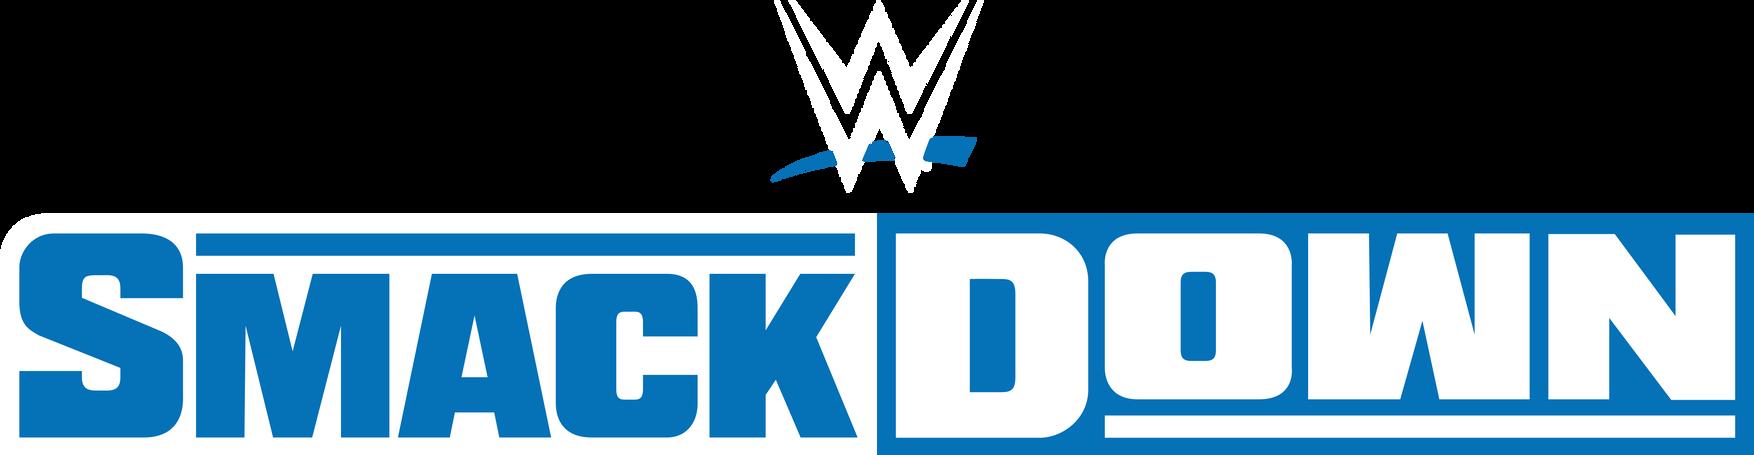 WWE SmackDown (2019) Logo 2